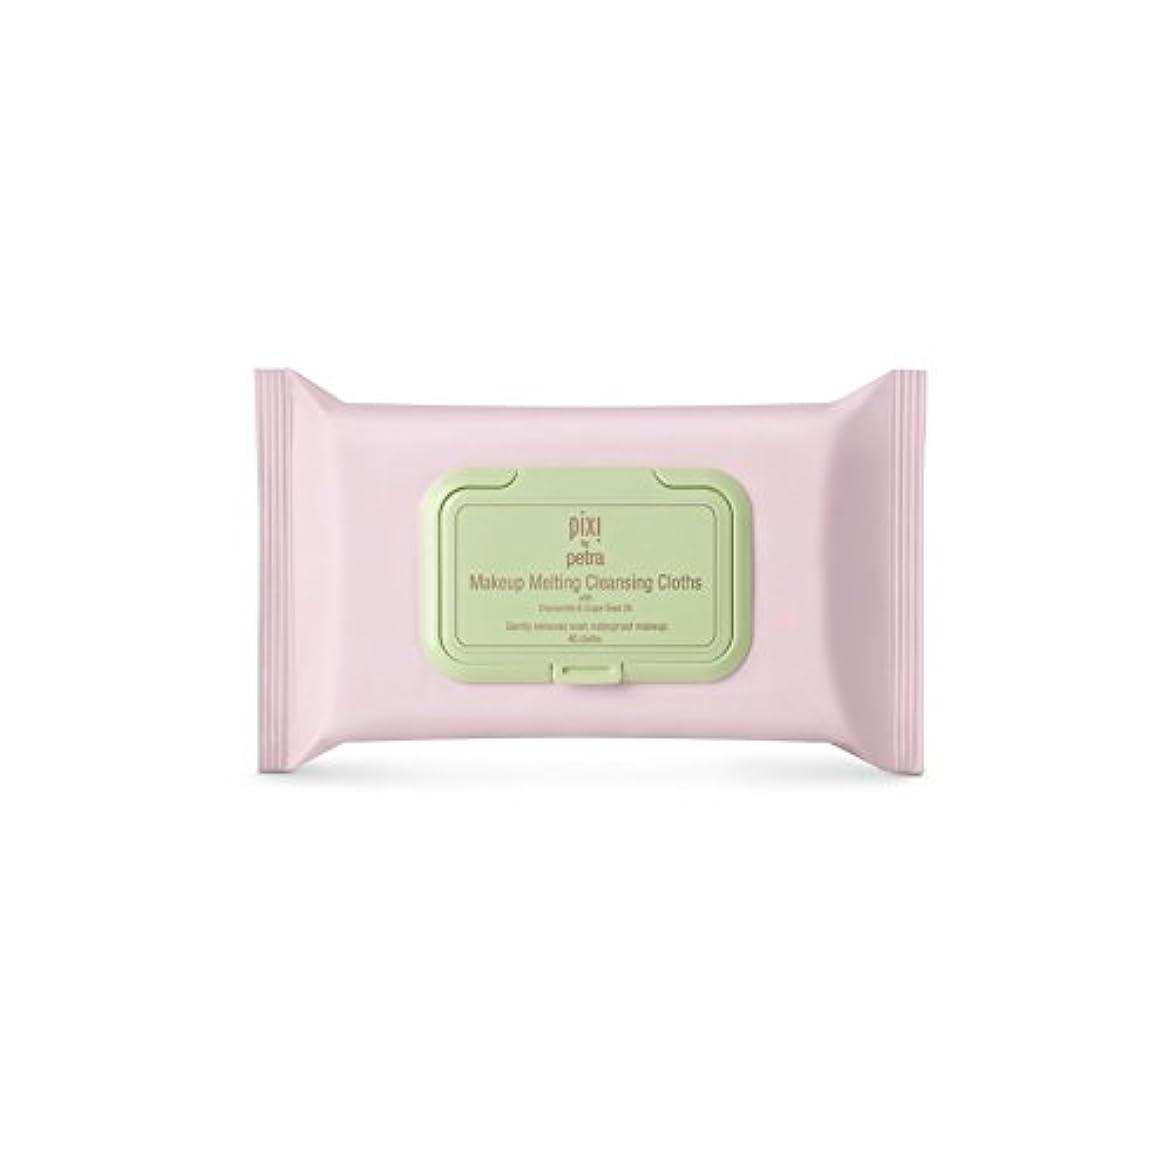 Pixi Makeup Melting Cleansing Cloths (Pack of 6) - 化粧溶融クレンジングクロス x6 [並行輸入品]